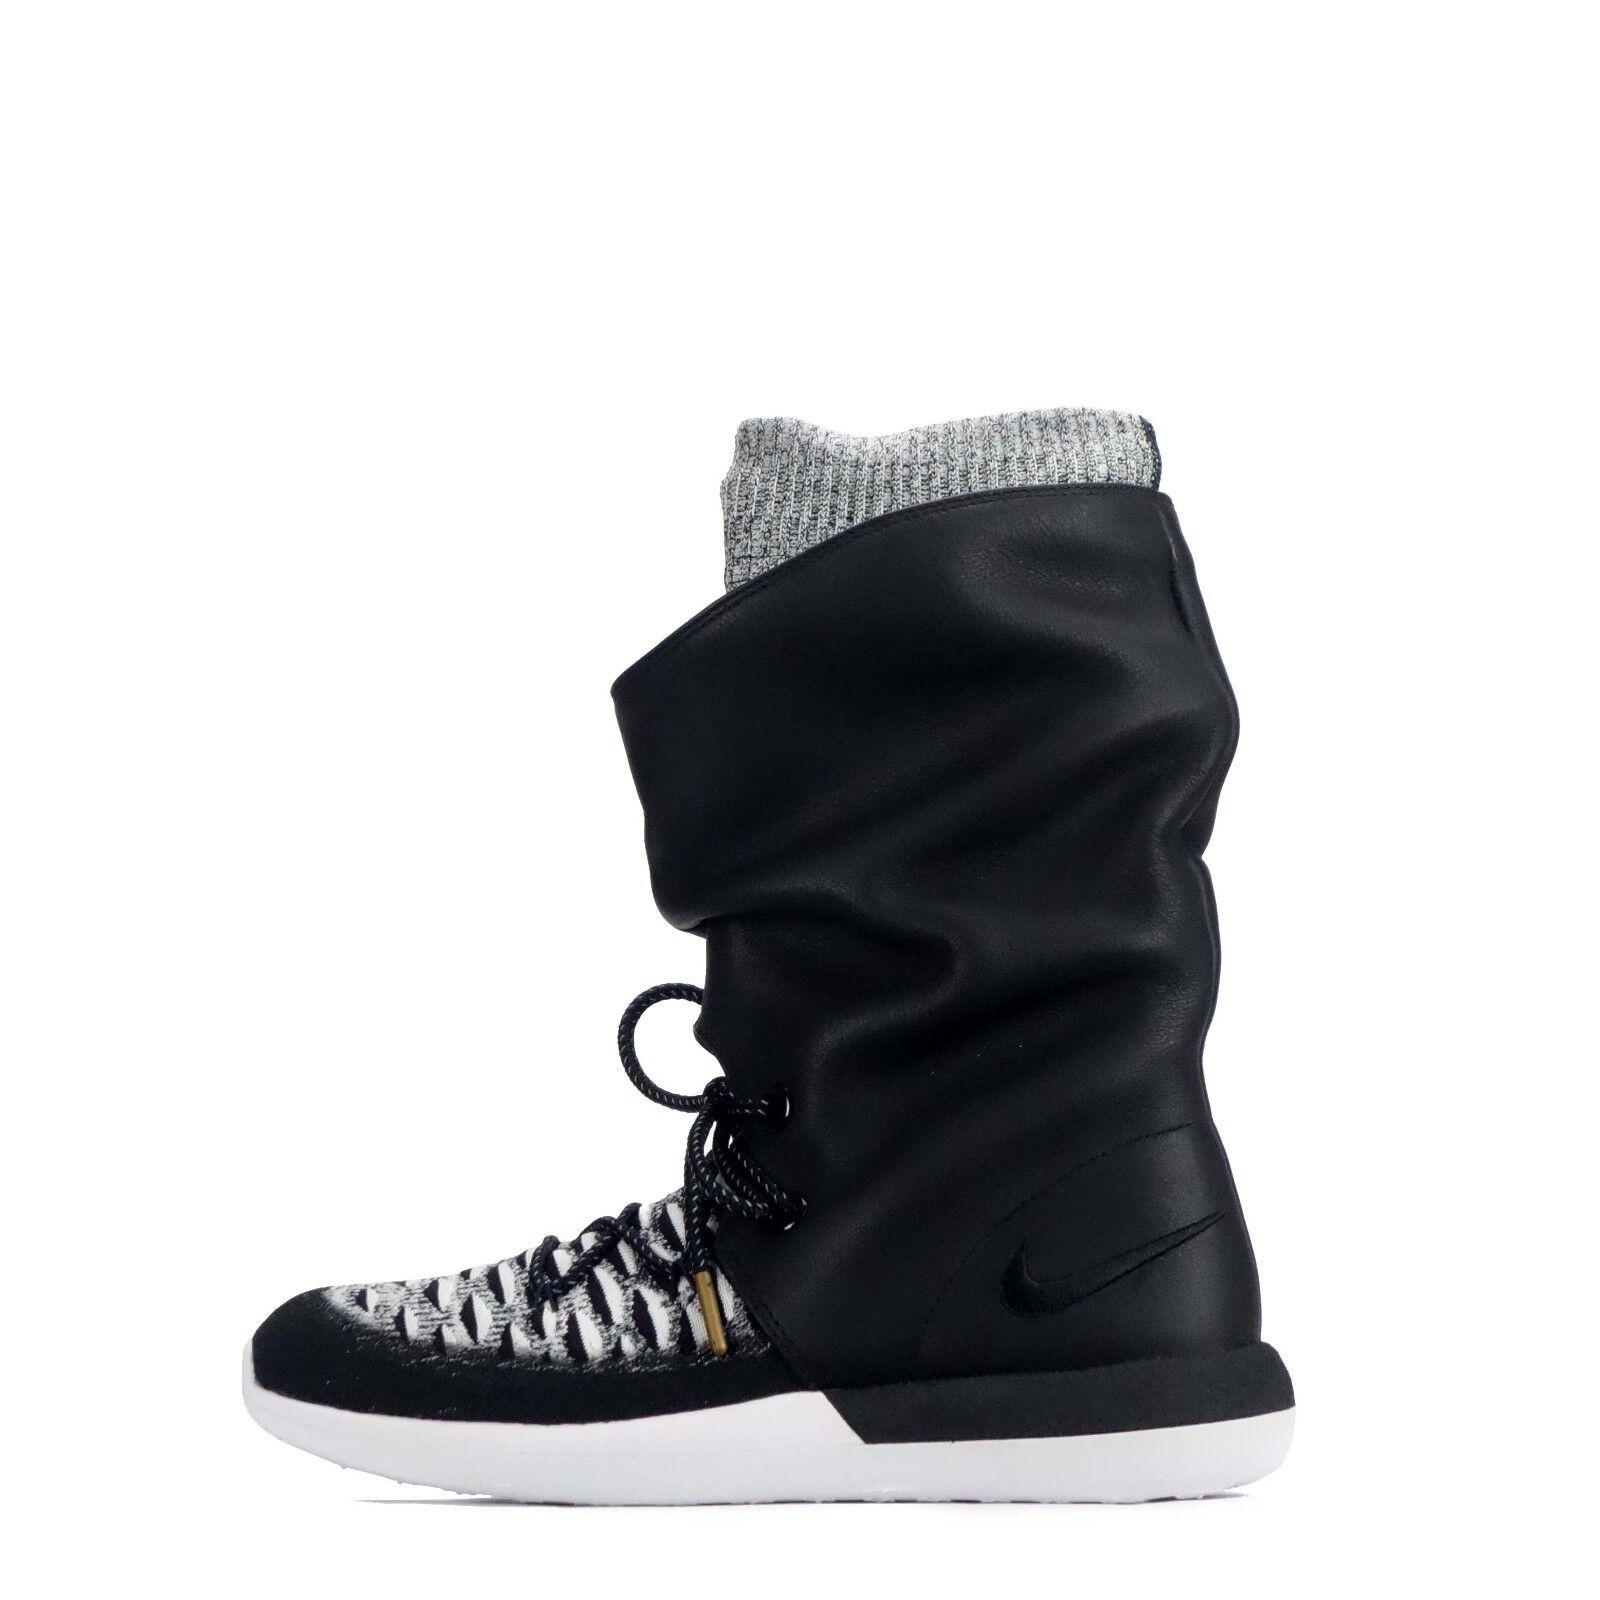 Nike Roshe Two Hi Flyknit Women's Ladies Casual Walking Fashion Shoes in Black